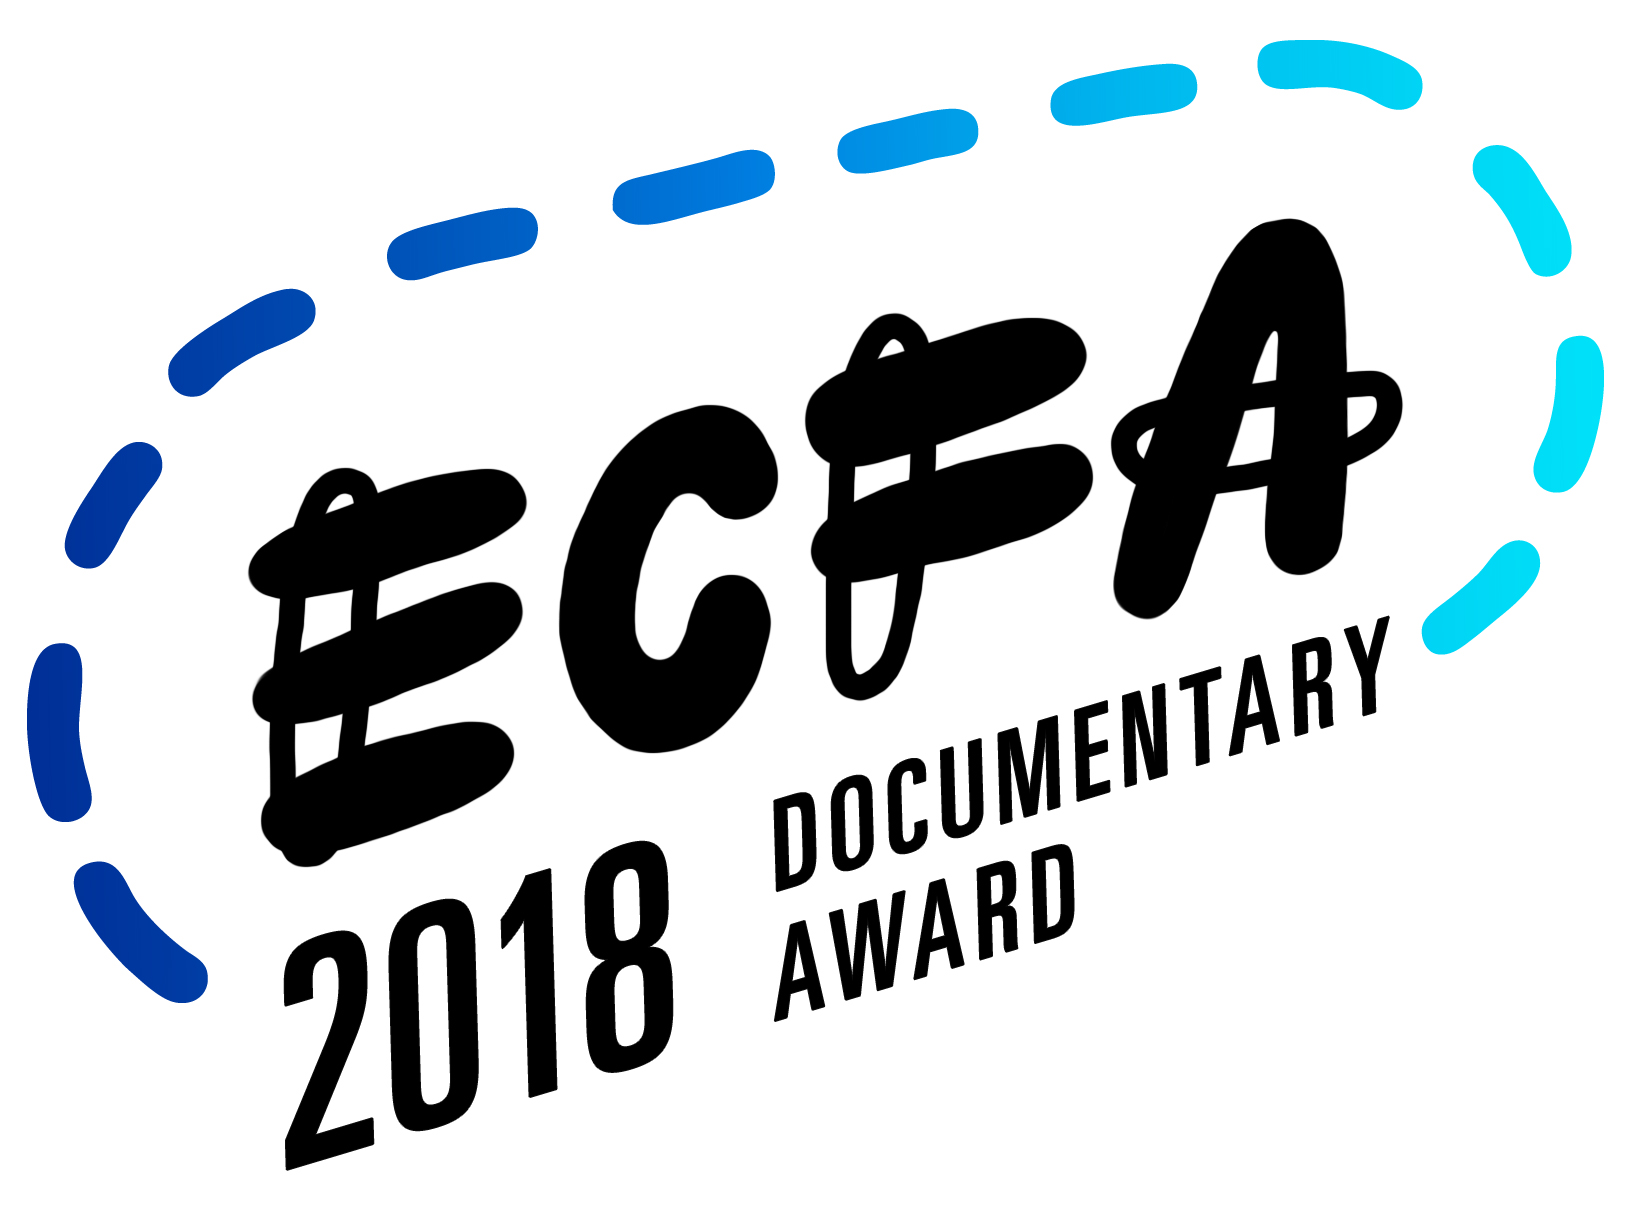 ECFA Documentary Award 2018